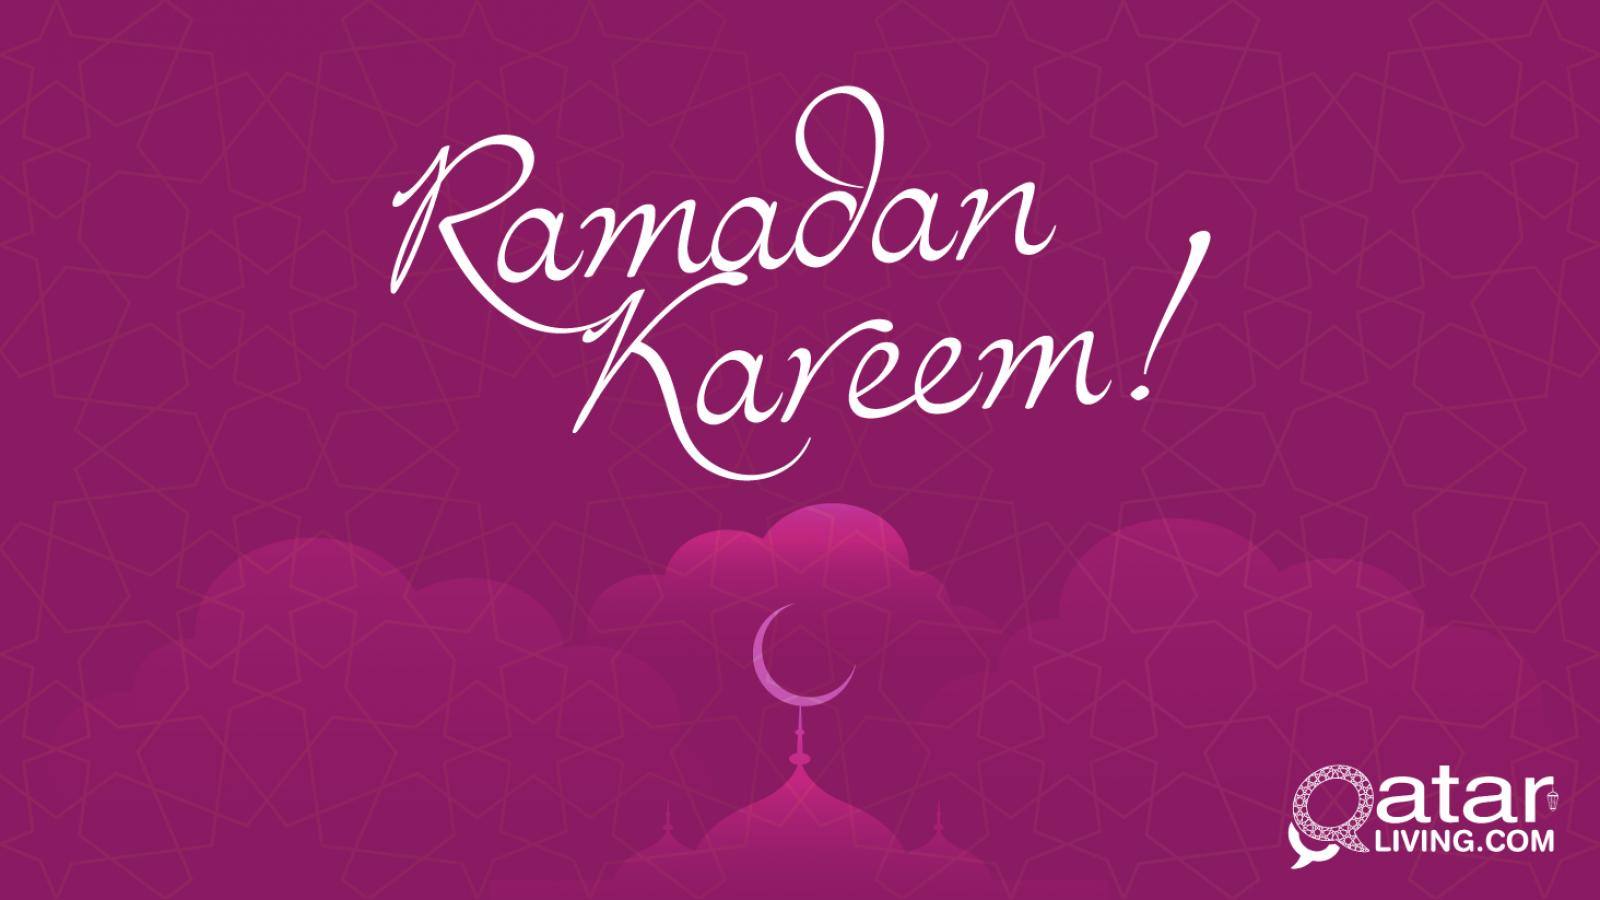 WATCH: Qatar observes the Holy Month of Ramadan